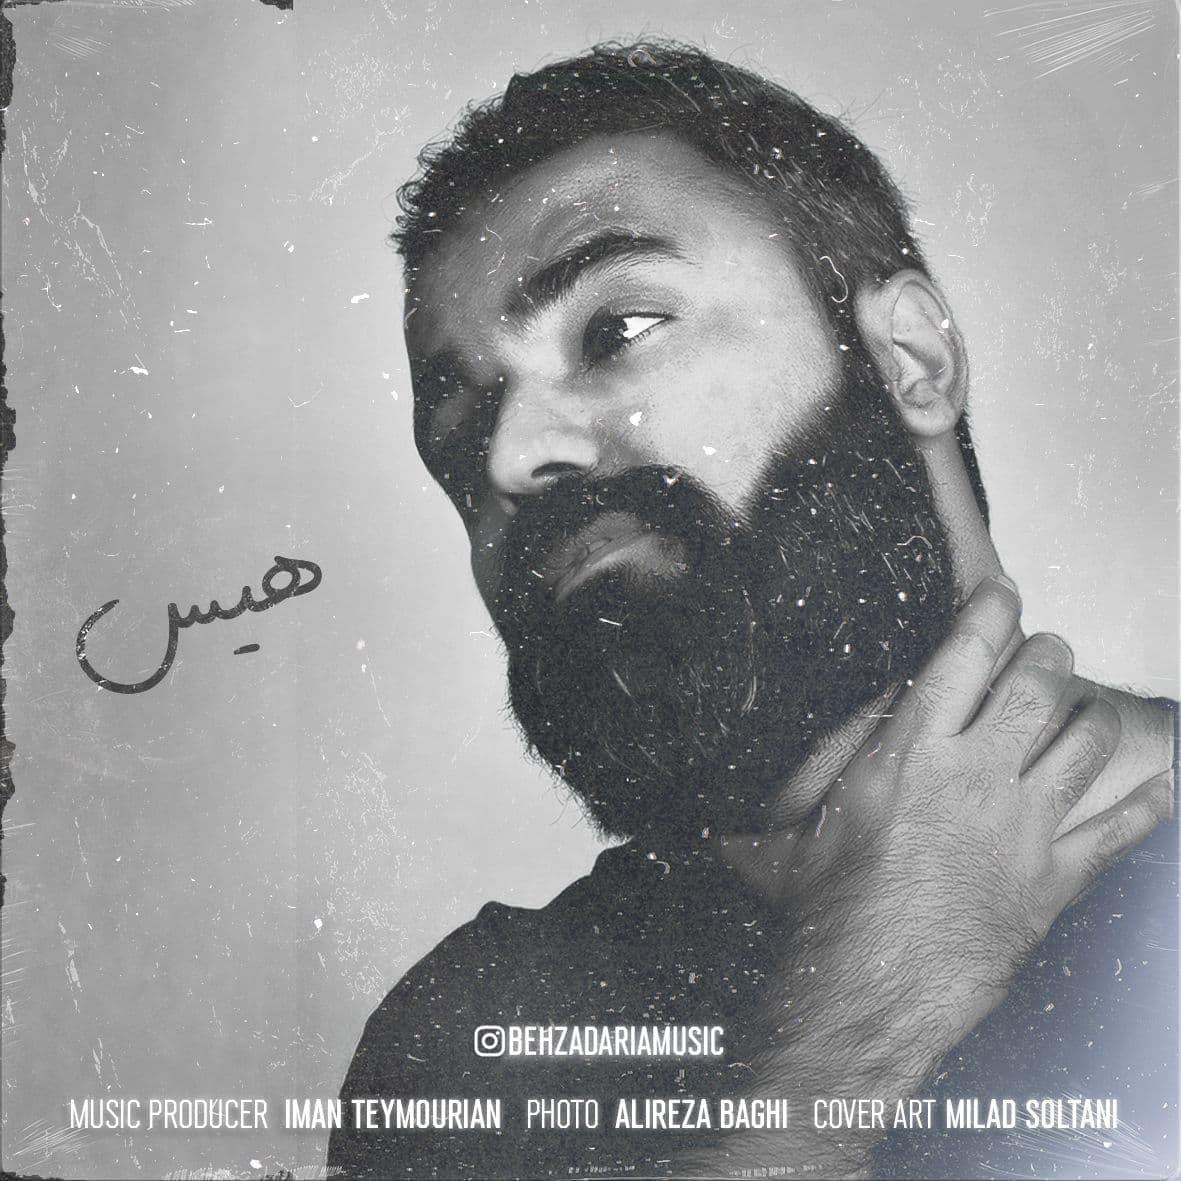 Behzad Aria – His